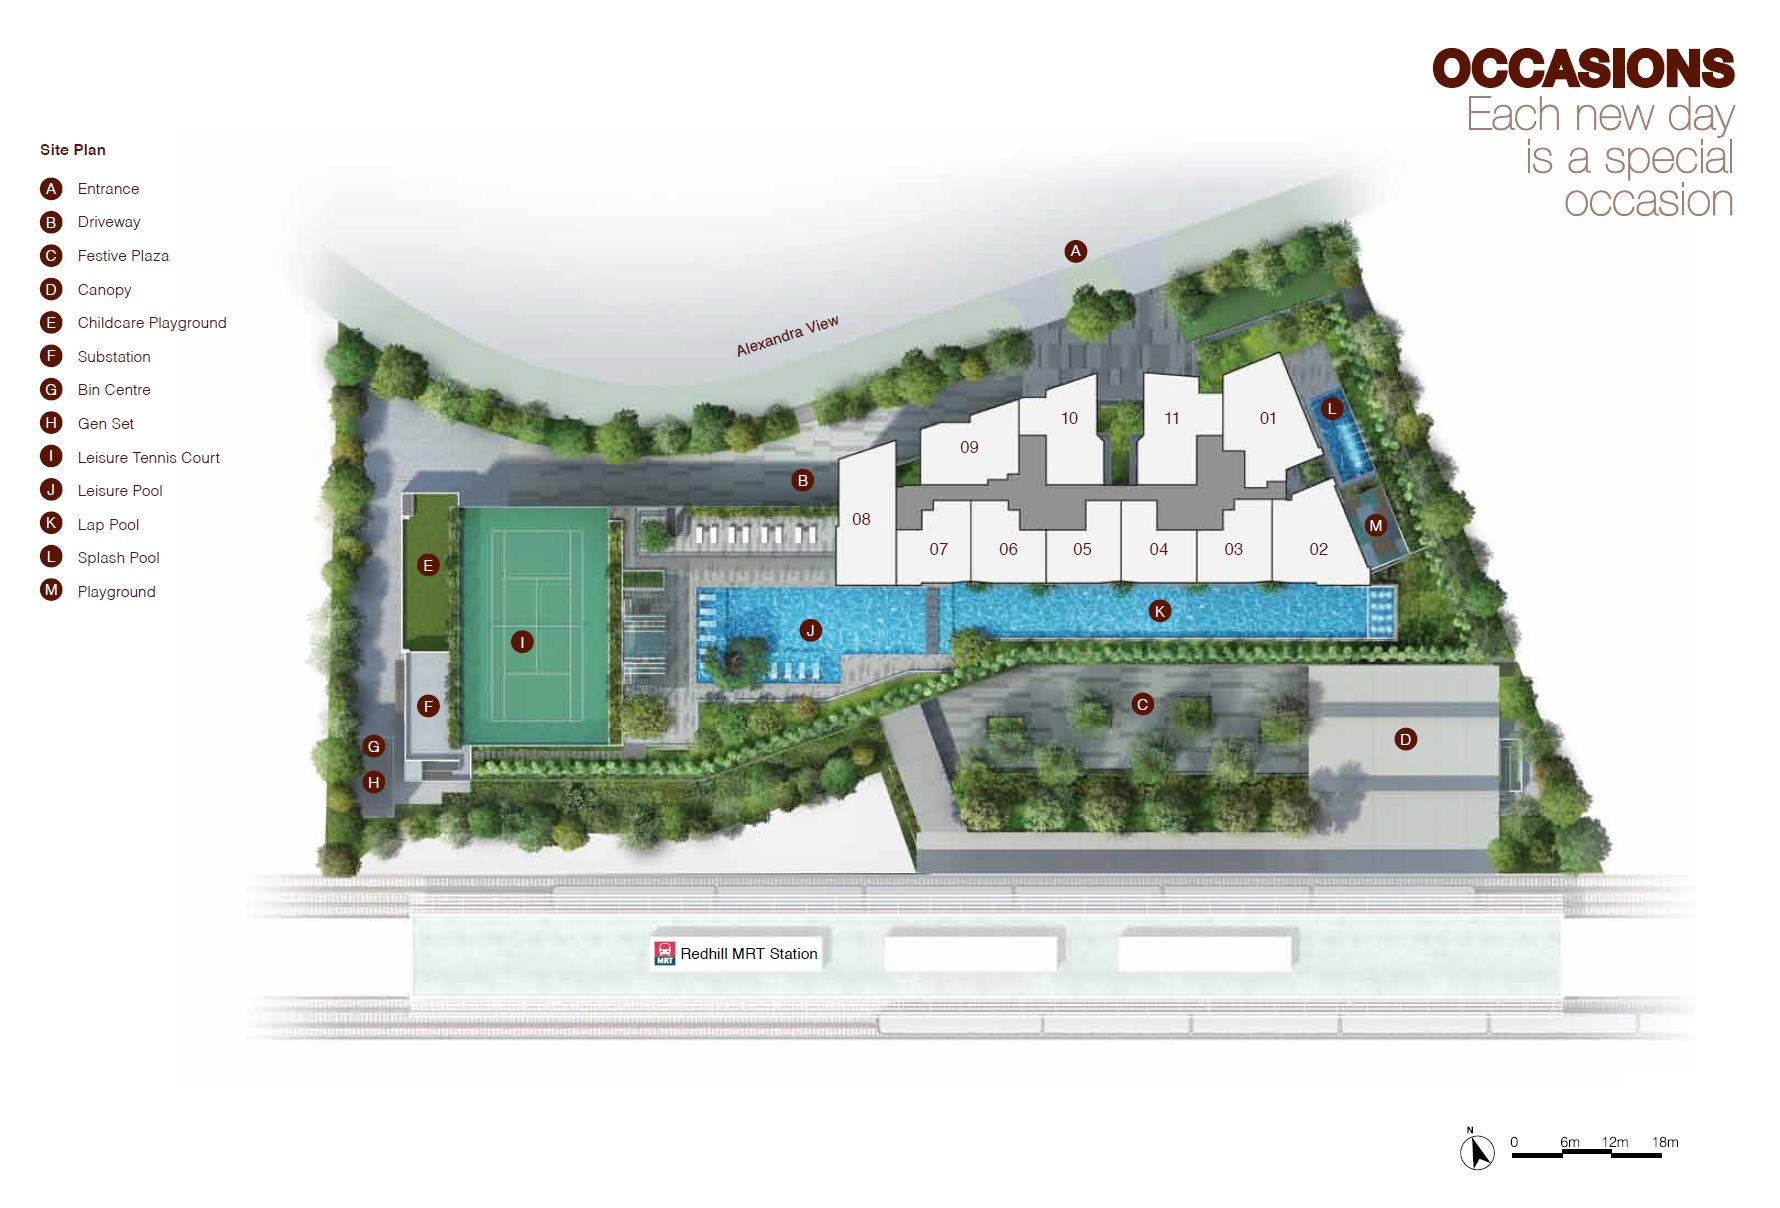 Artra site plan